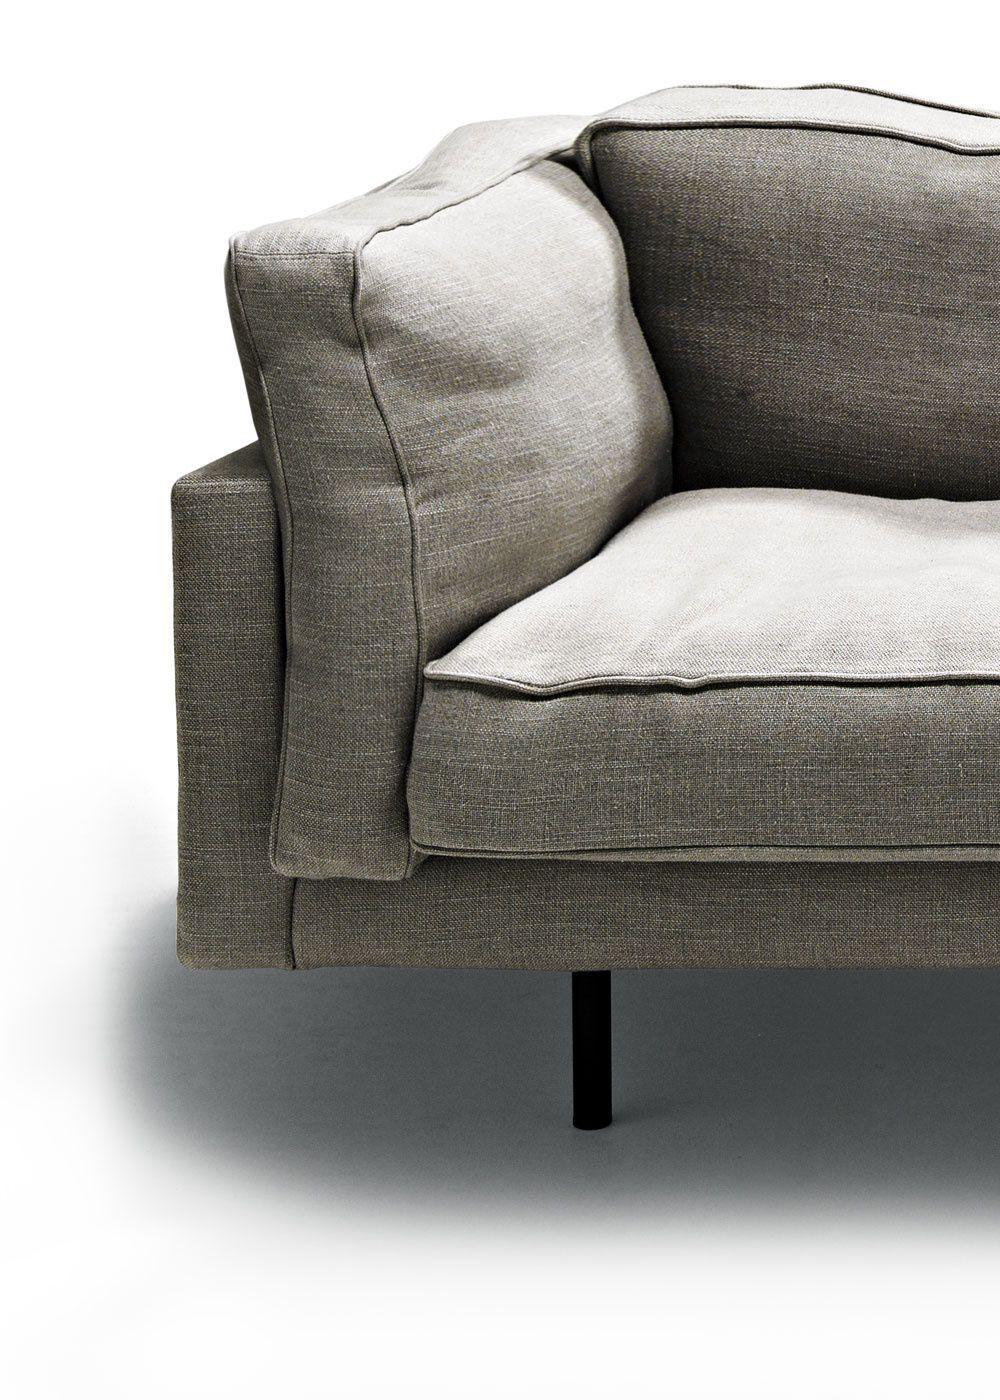 Contemporary sofa / leather / steel / fabric - SQUARE 16 - DePadova